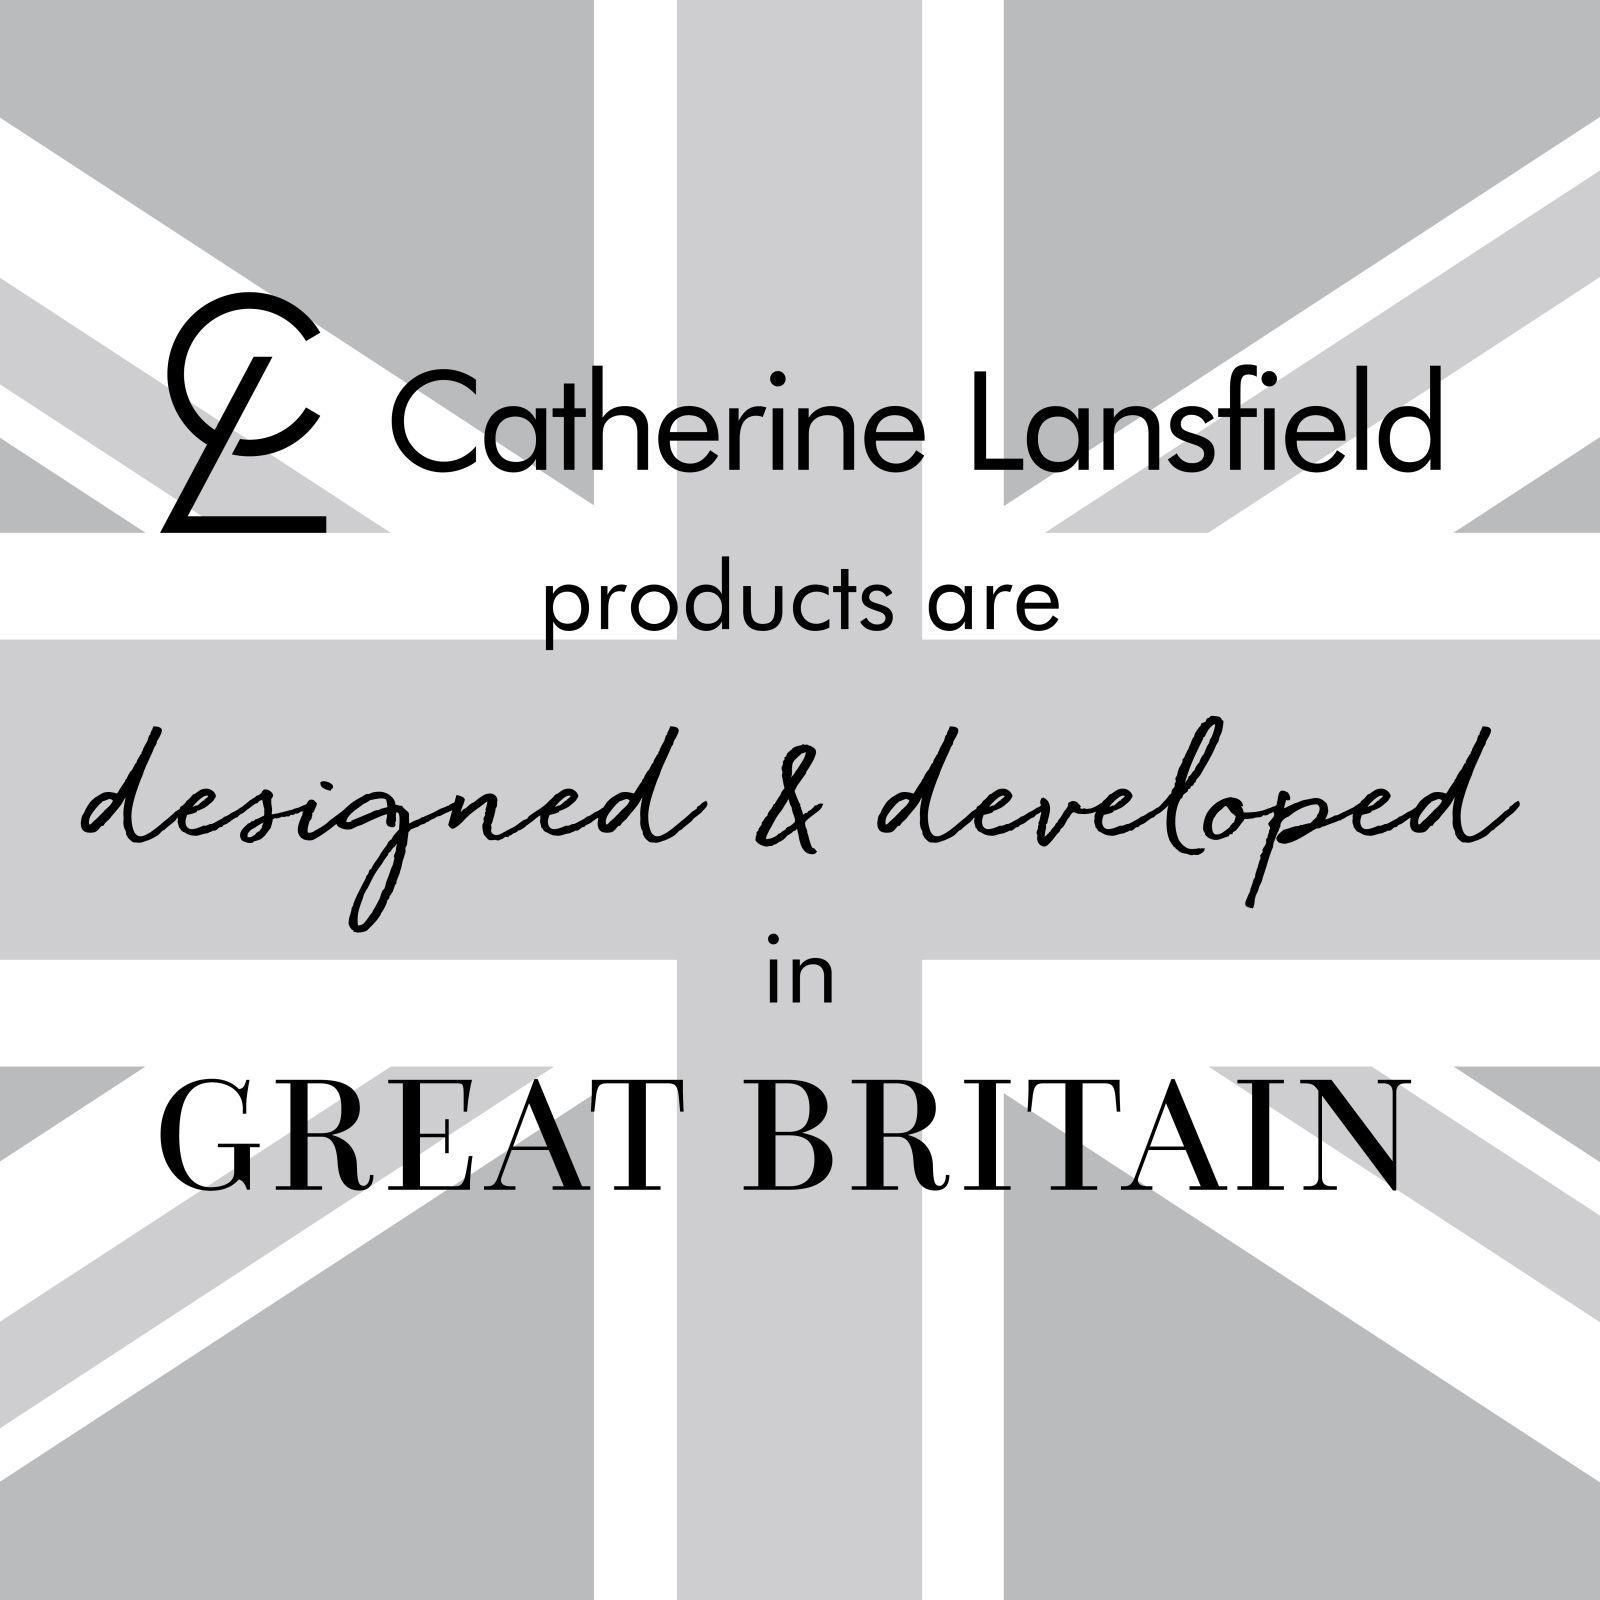 Catherine-Lansfield-Salisbury-Pink-cubierta-del-edredon-edredon-cubre-floral-de-conjuntos-de-cama miniatura 16